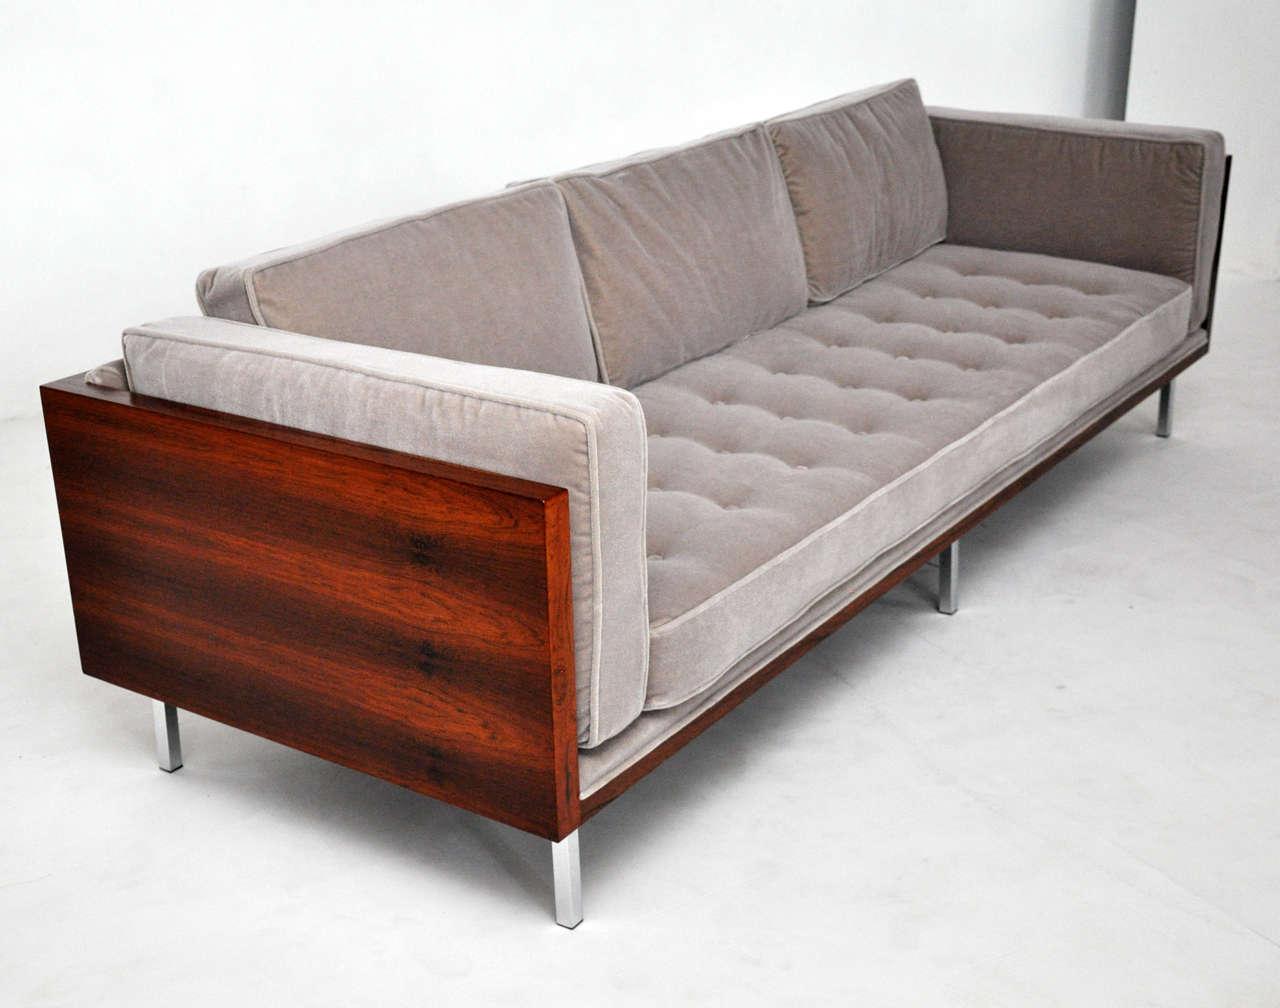 Beautiful 8ft Rosewood Case Sofa By Milo Baughman. Fully Restored. Beautiful Rosewood  Wood Grain.